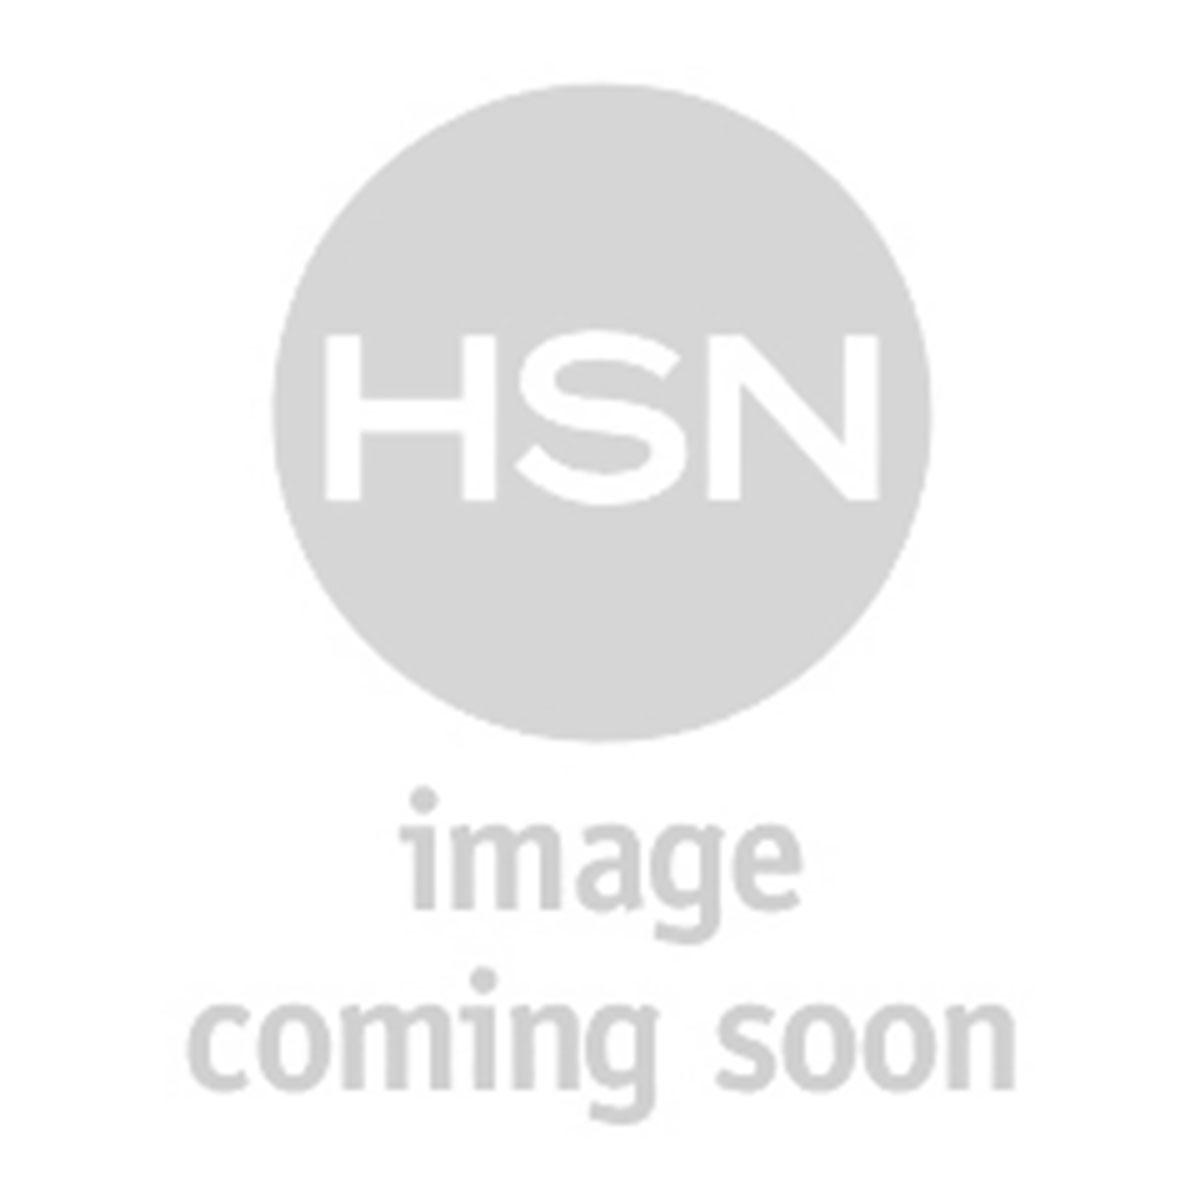 Origami Kitchen Cart With Wood Top Kitchen Design Ideas